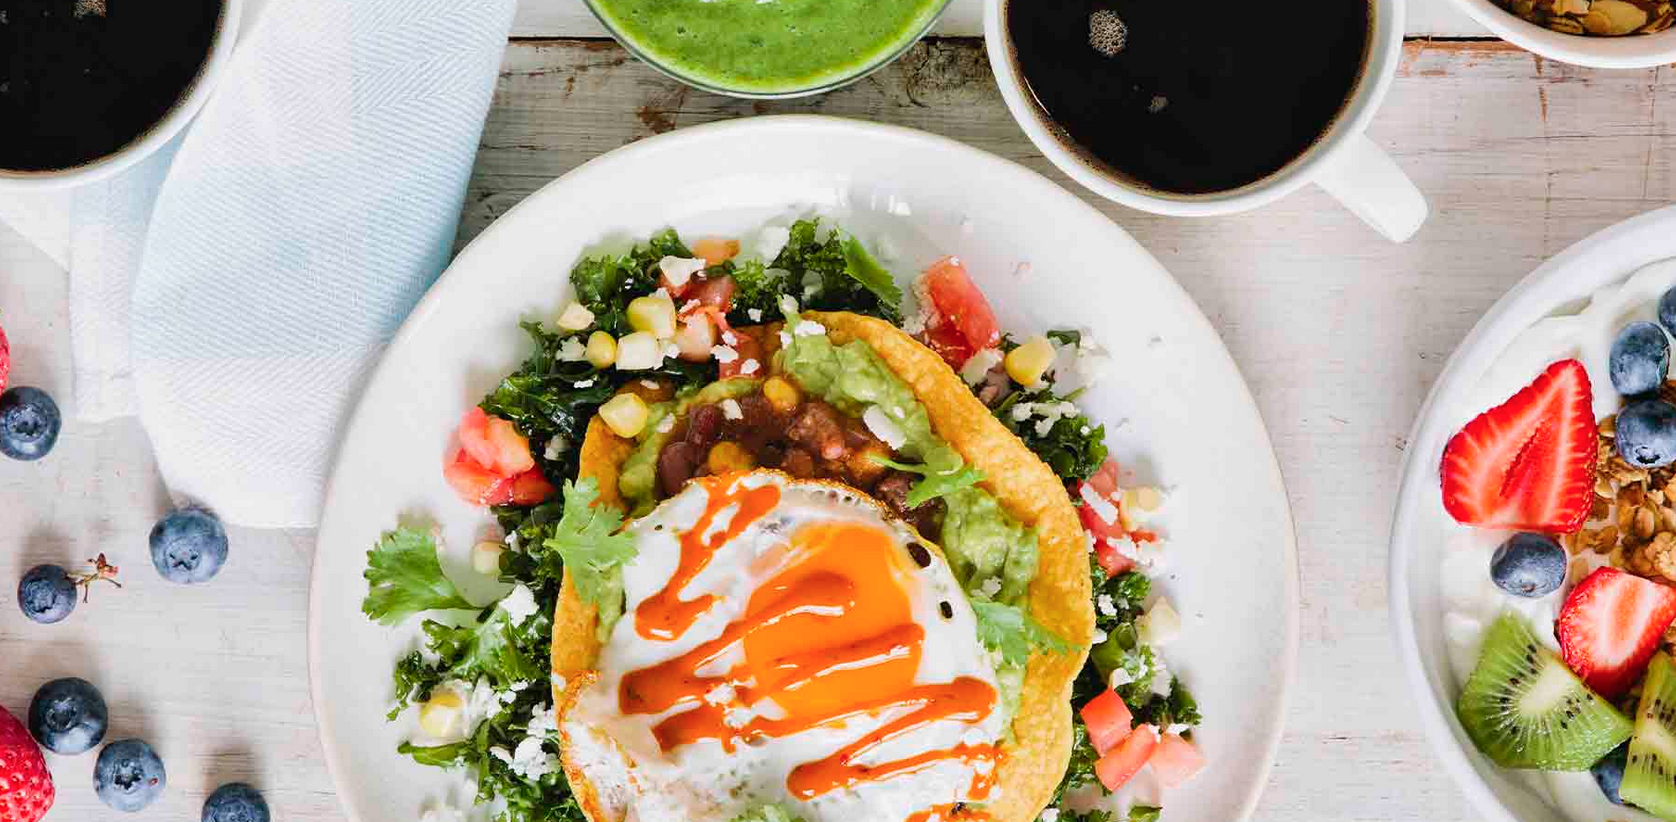 BGood brunch display including a sunny side up egg over a taco bowl